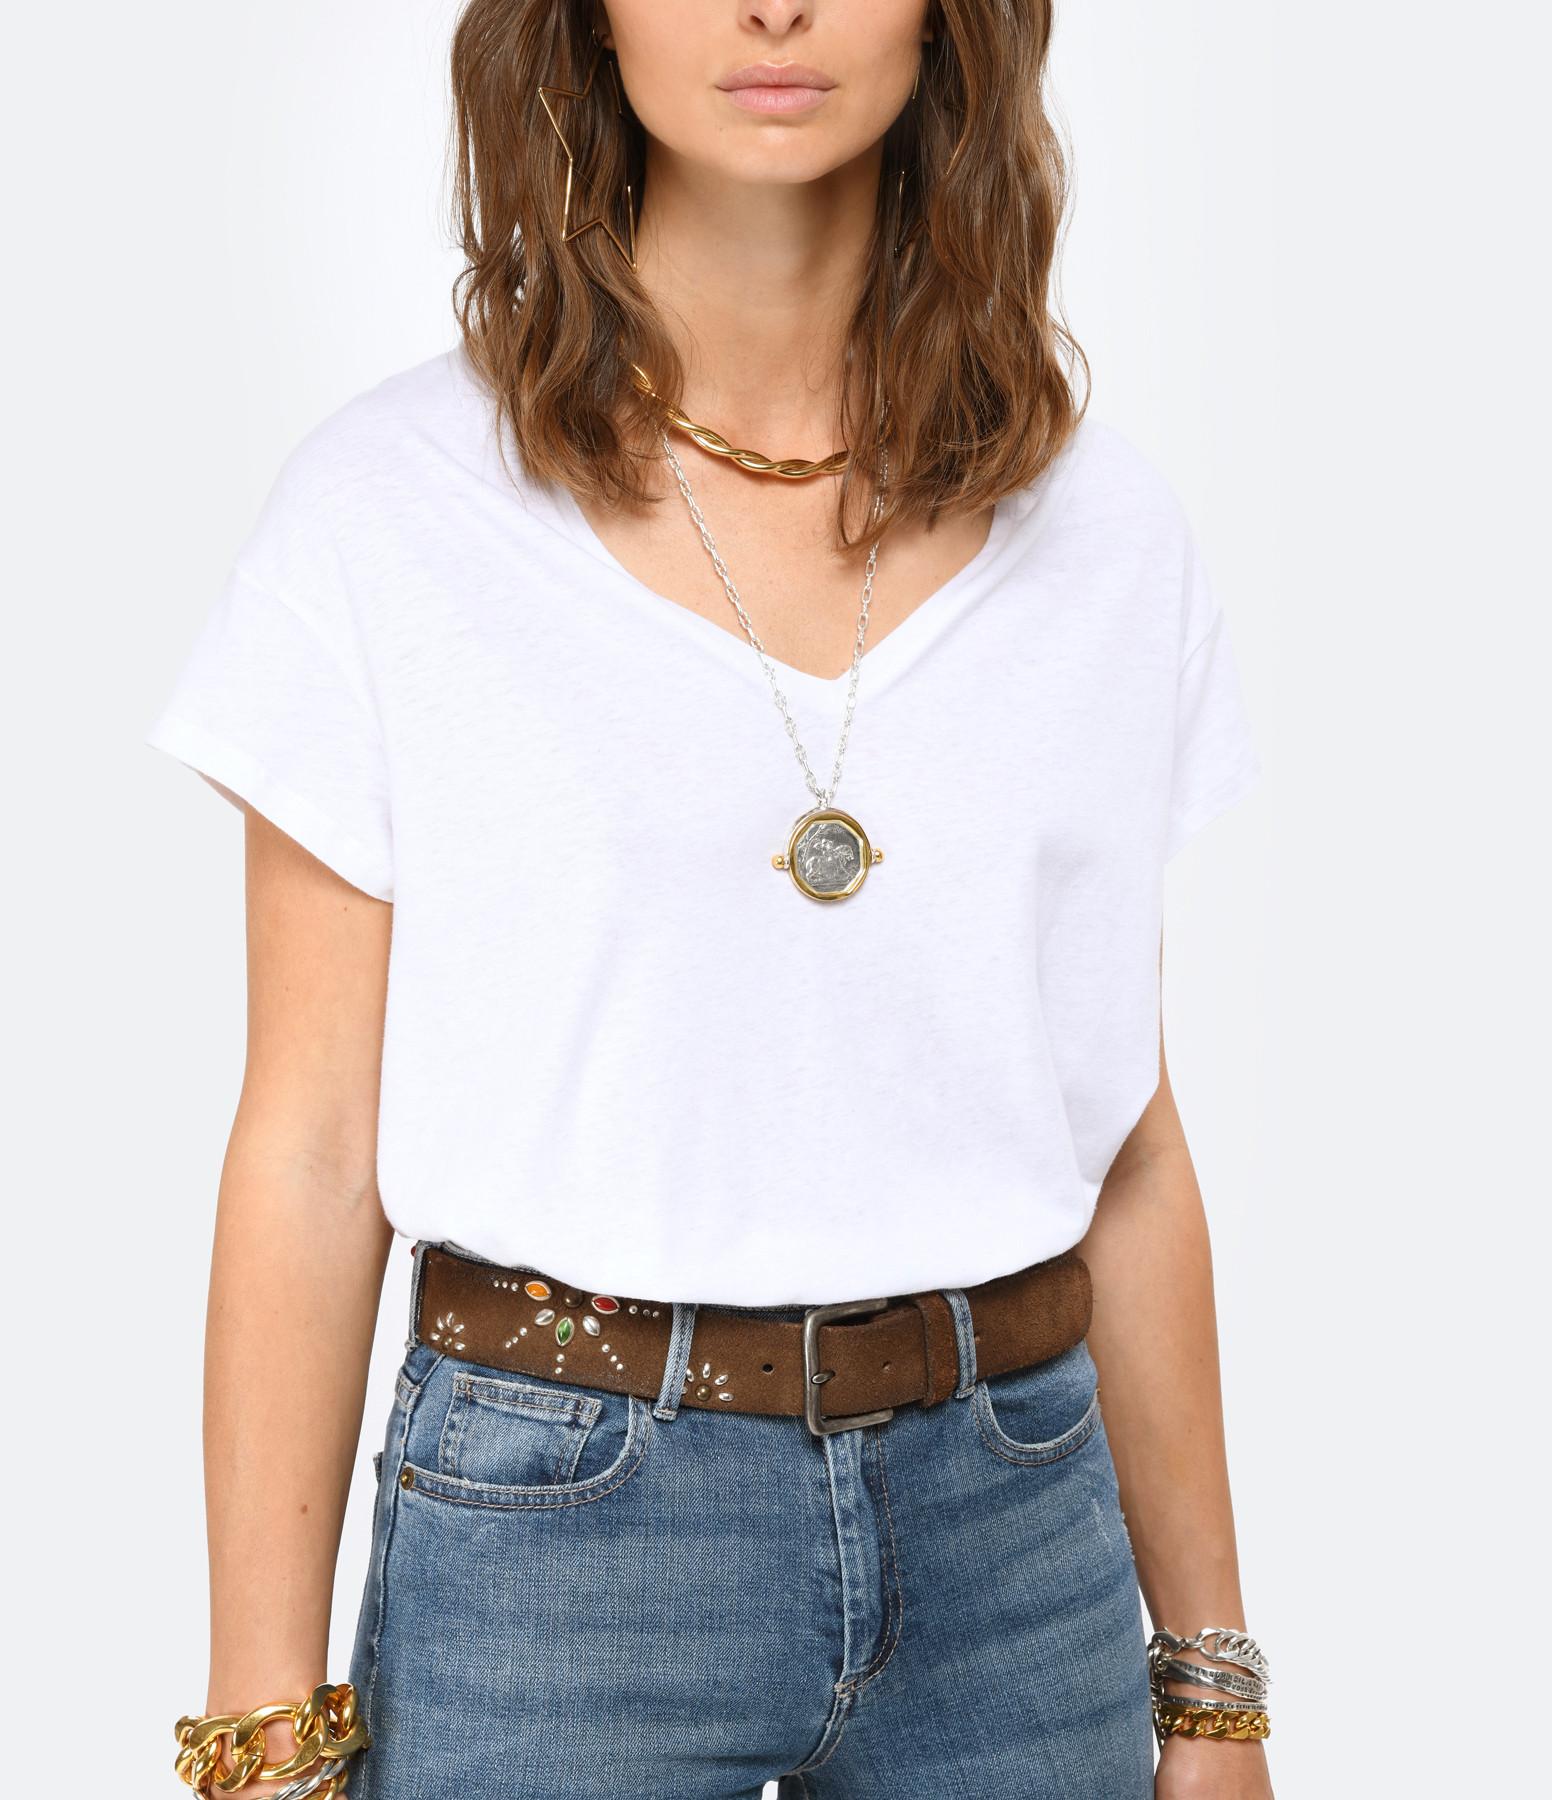 JEANNE VOULAND - Tee-shirt Bacha Coton Lin Blanc